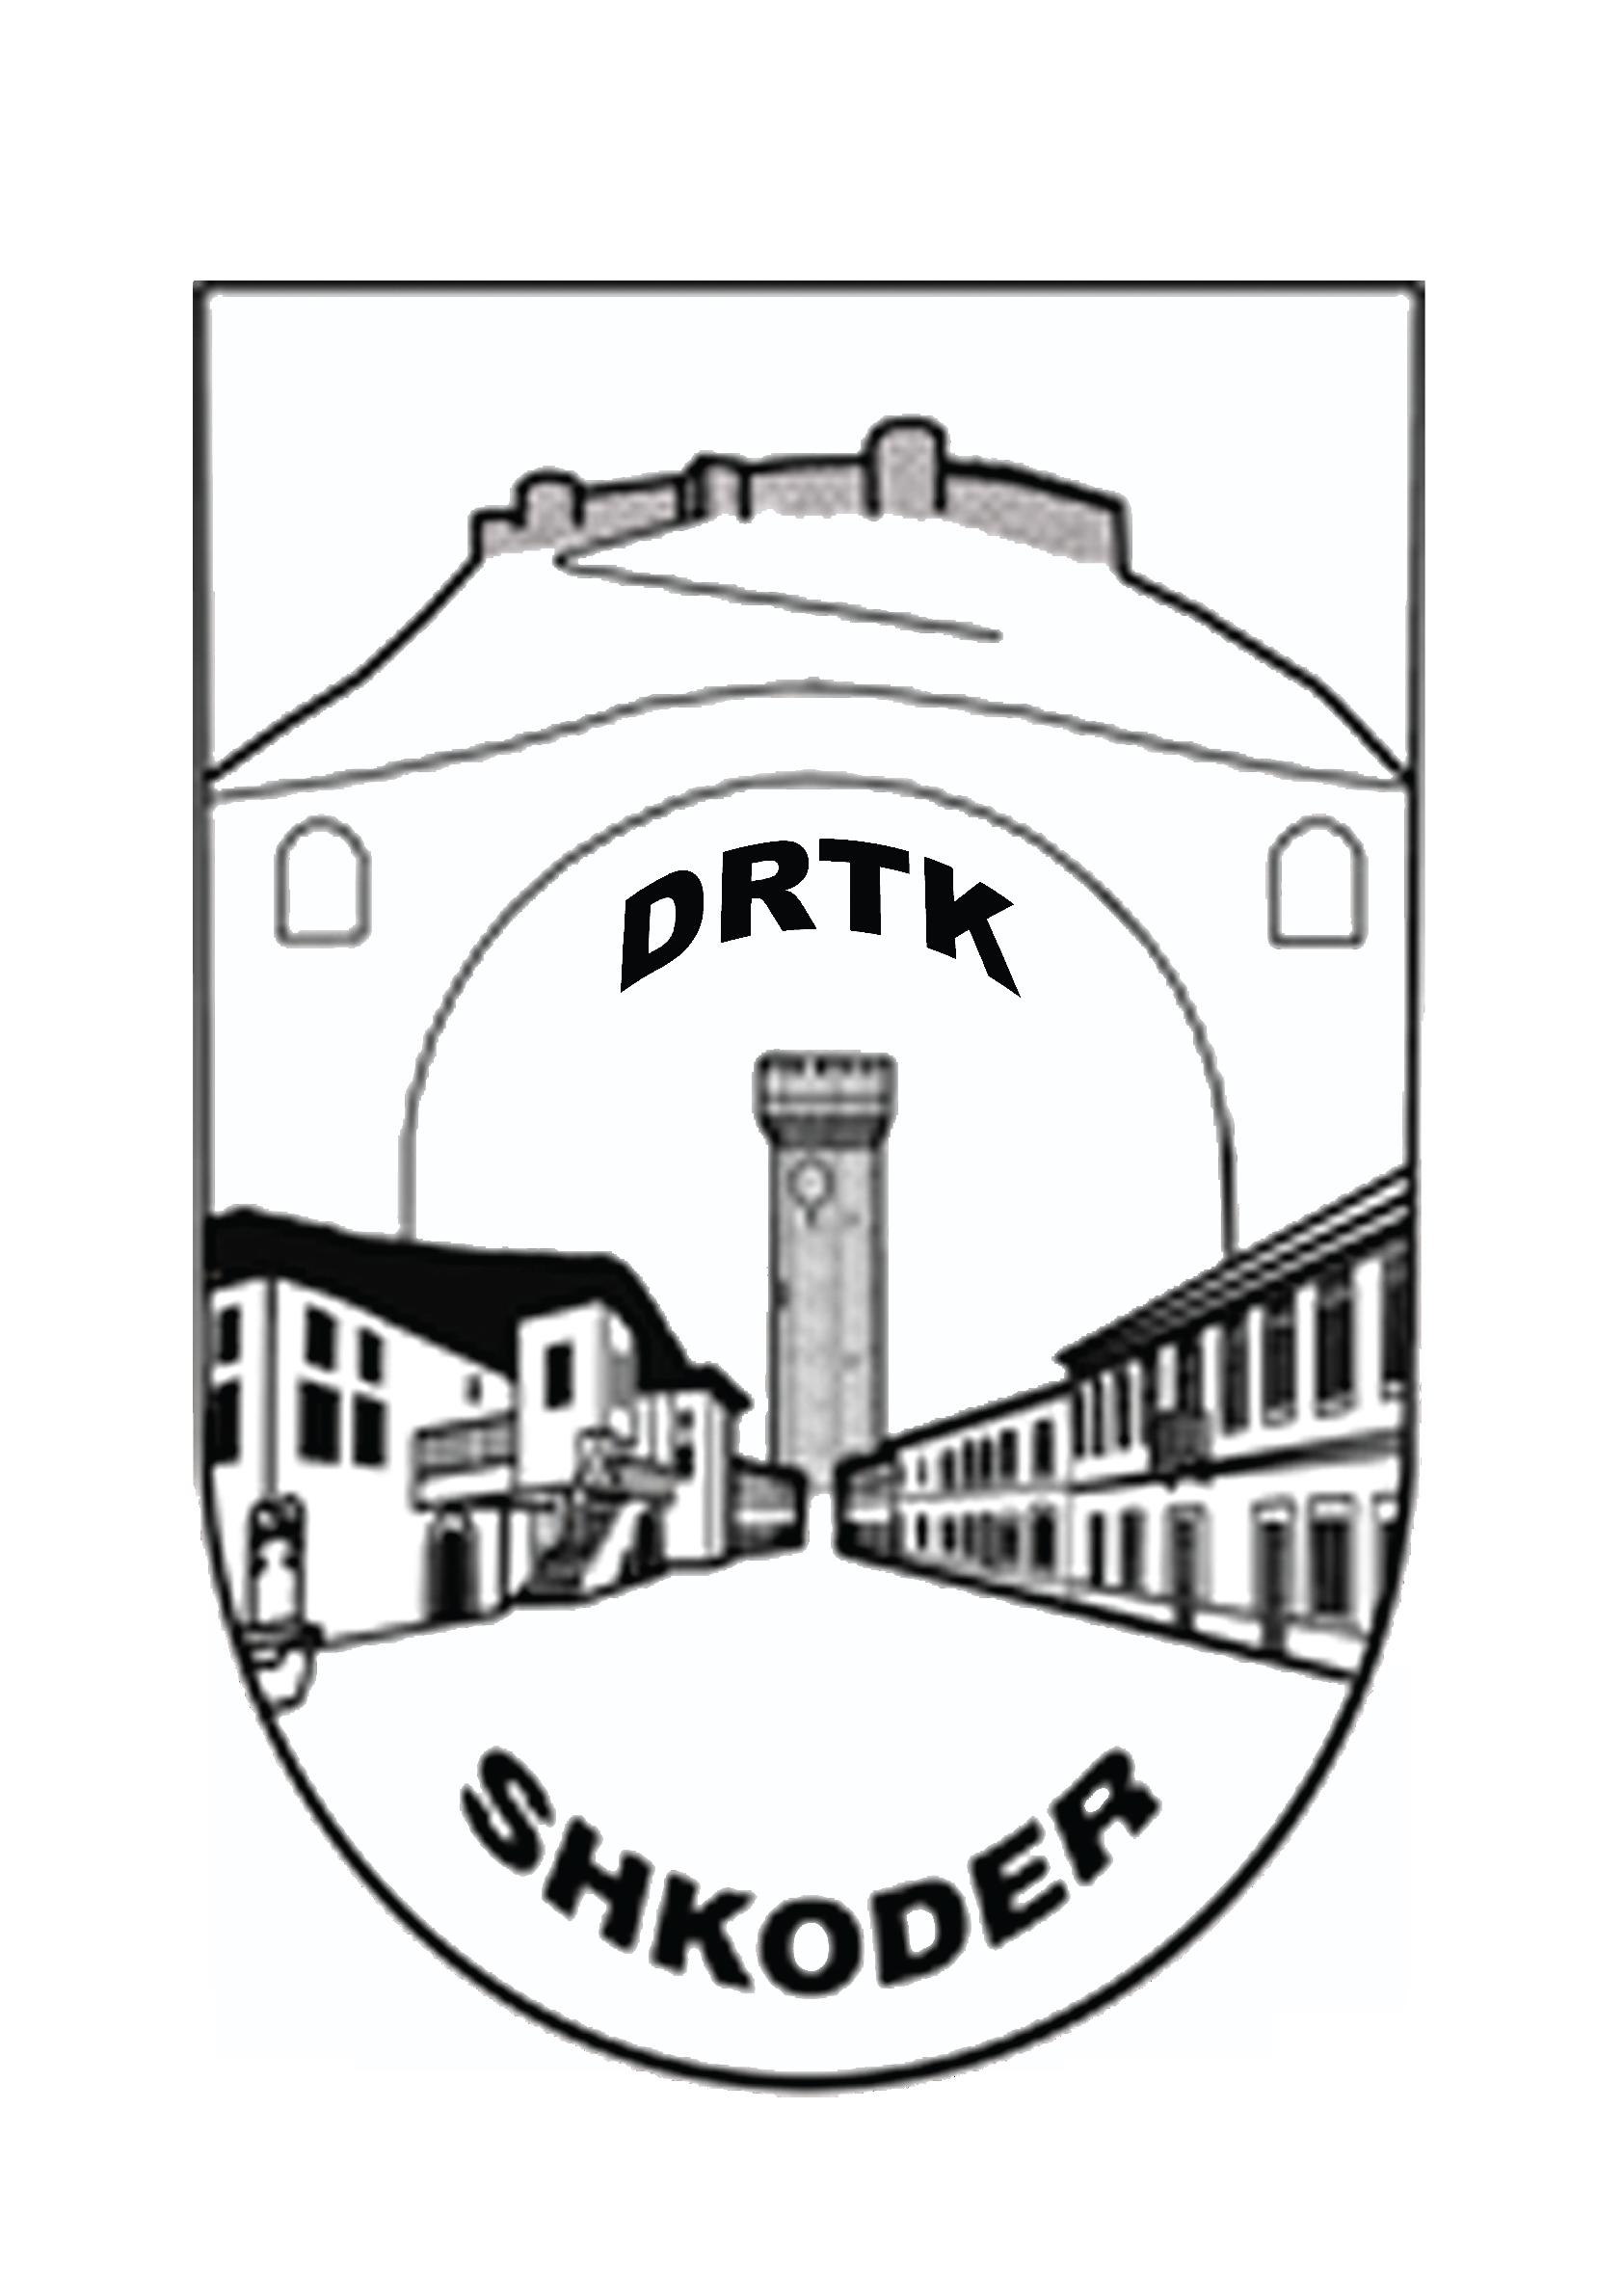 logo DRTK 2